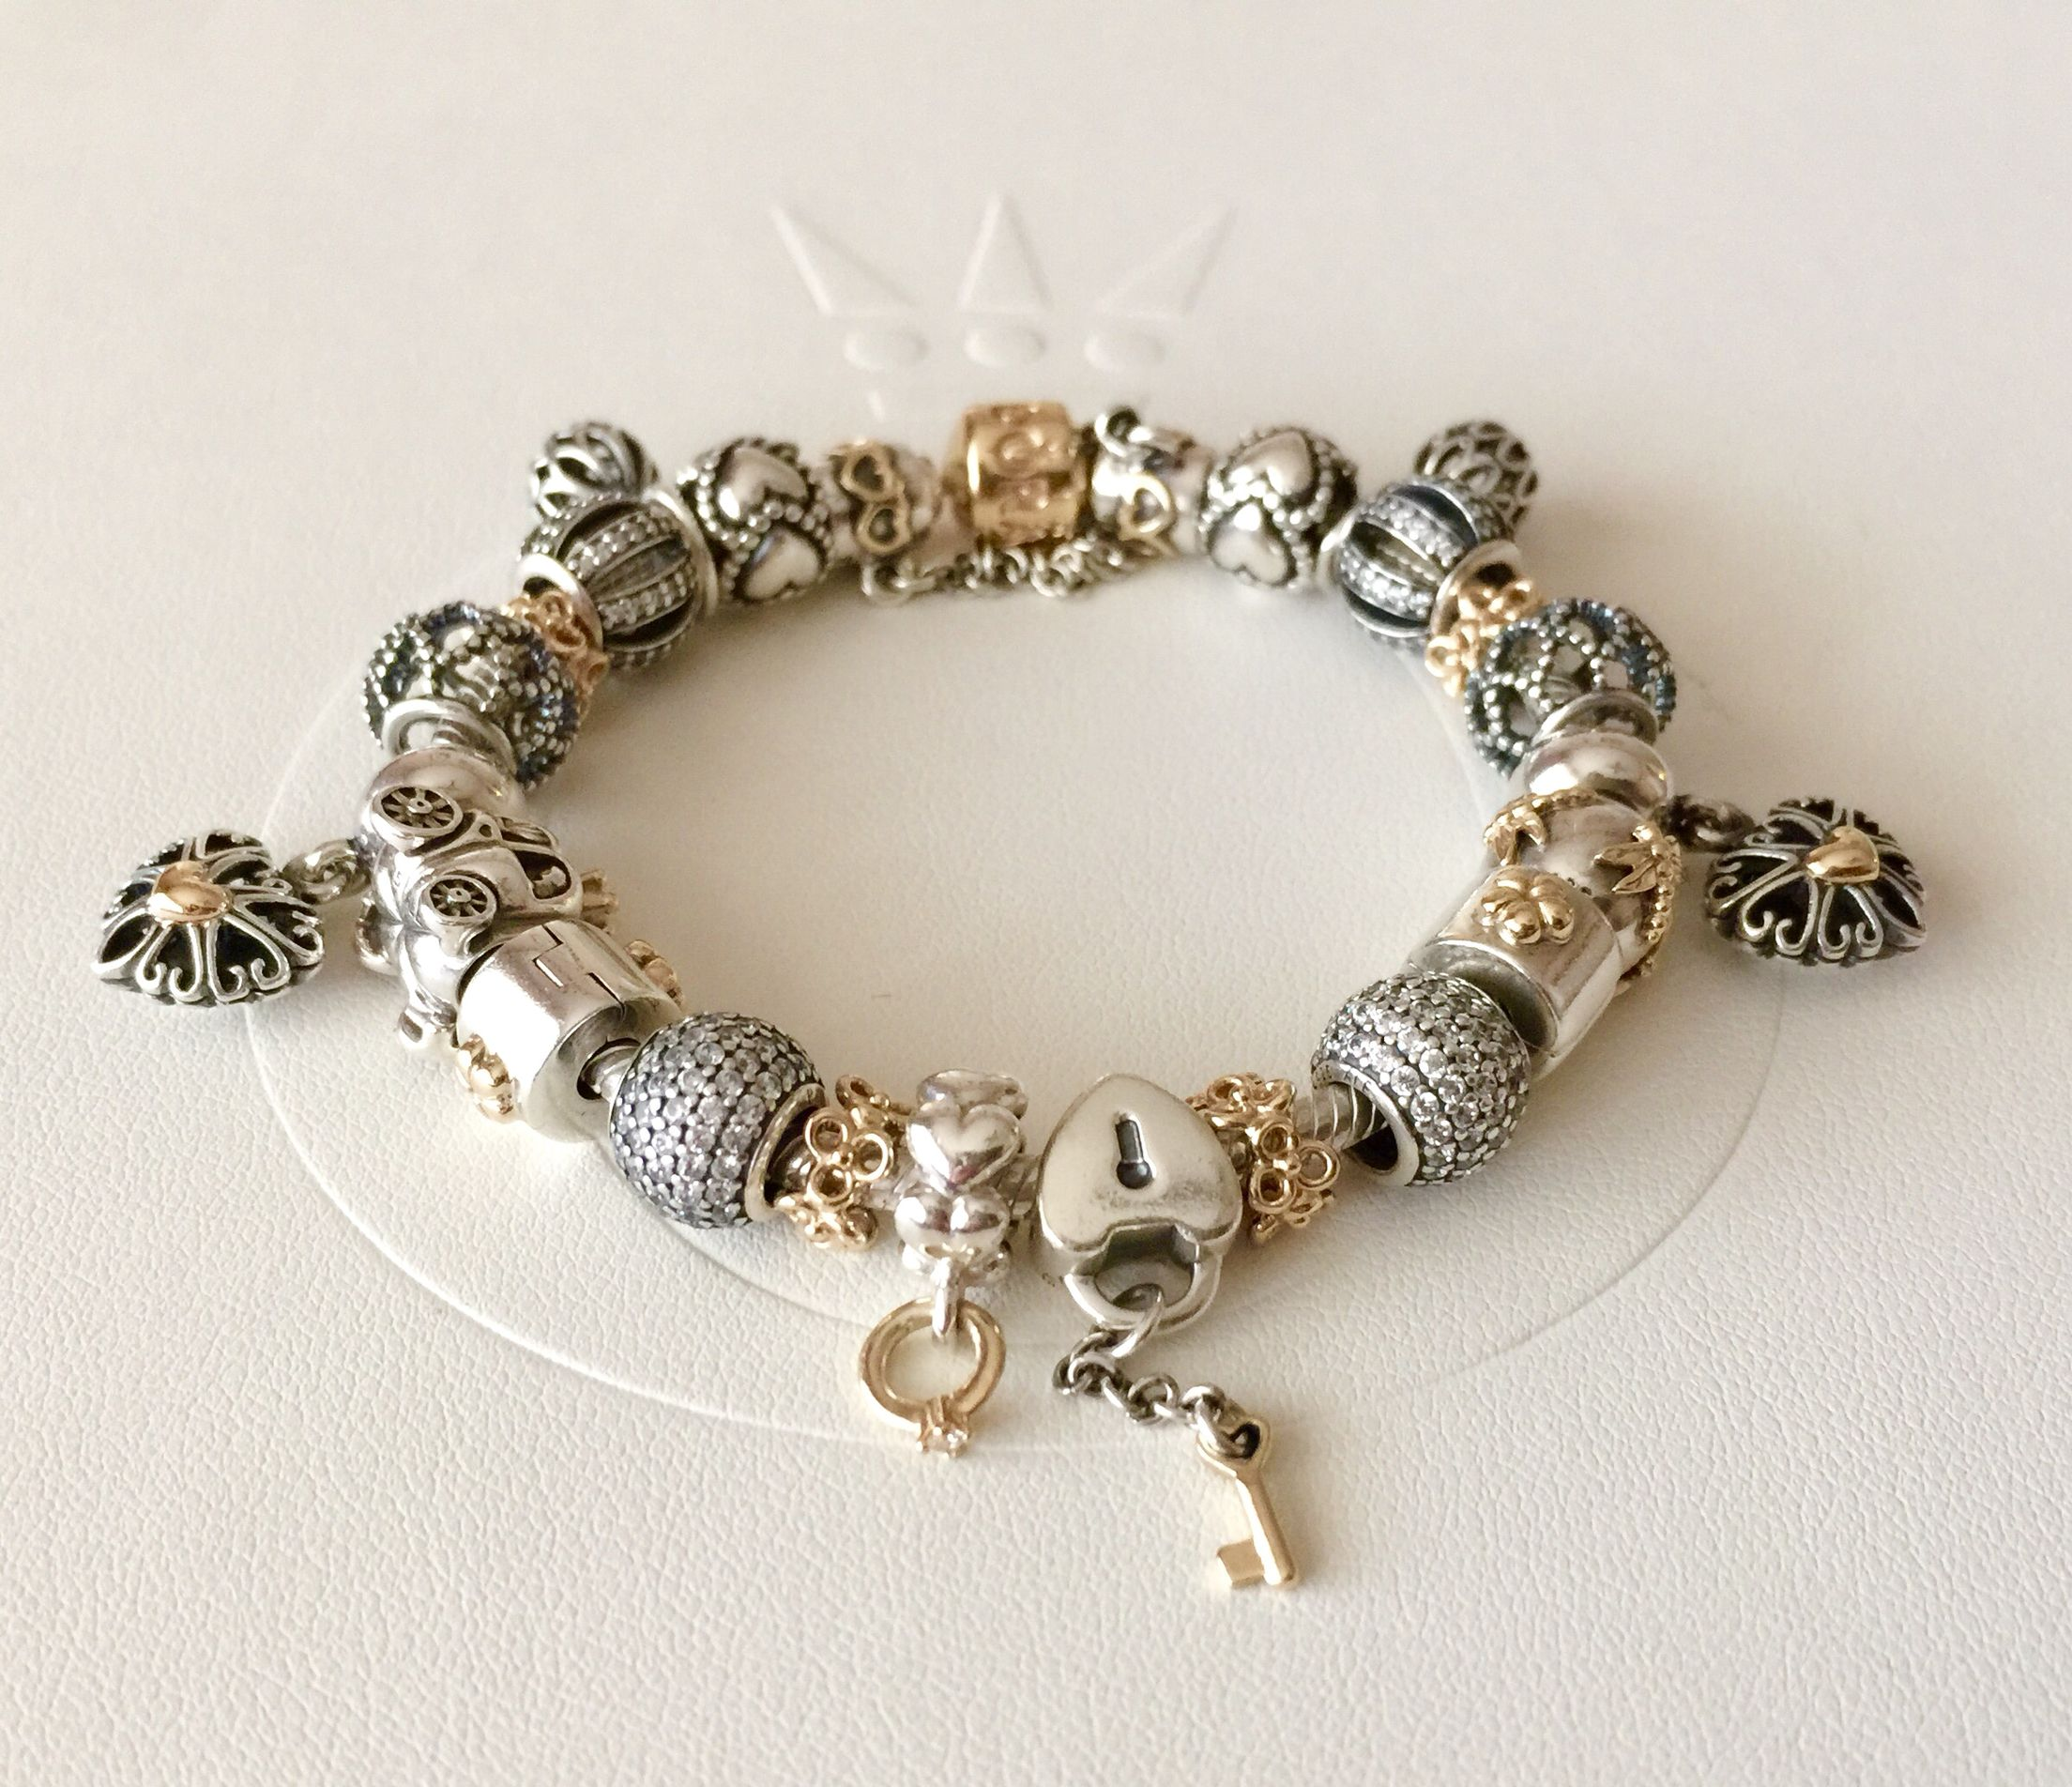 How Much Is A Pandora Charm Bracelet: #MyPANDORA My Happily Married Two Tone PANDORA Bracelet